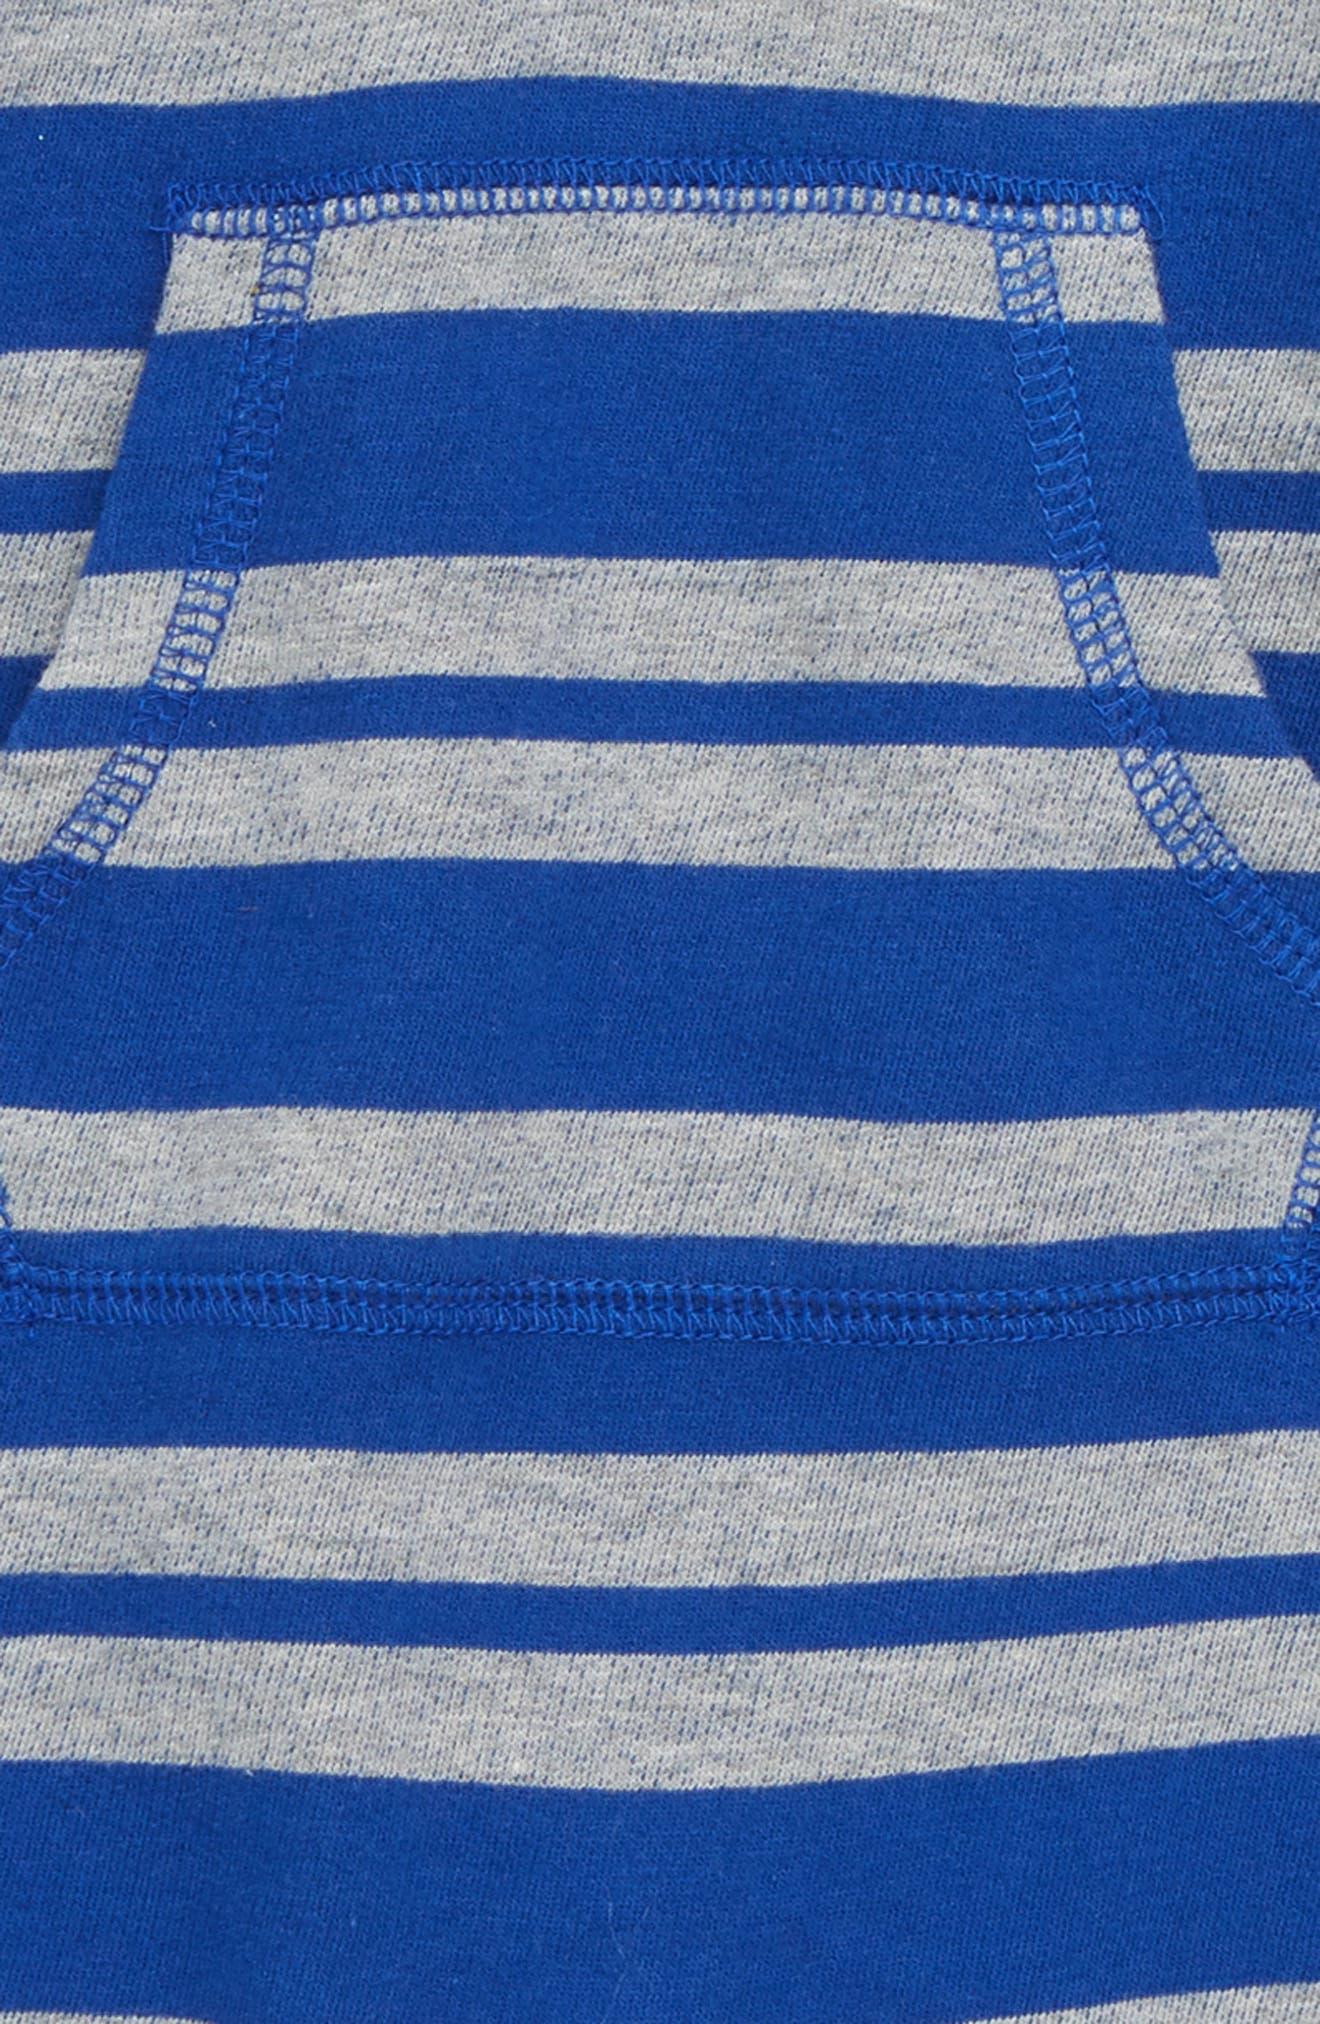 Stripe Hooded Romper,                             Alternate thumbnail 2, color,                             BLUE MAZARINE- GREY STRIPE